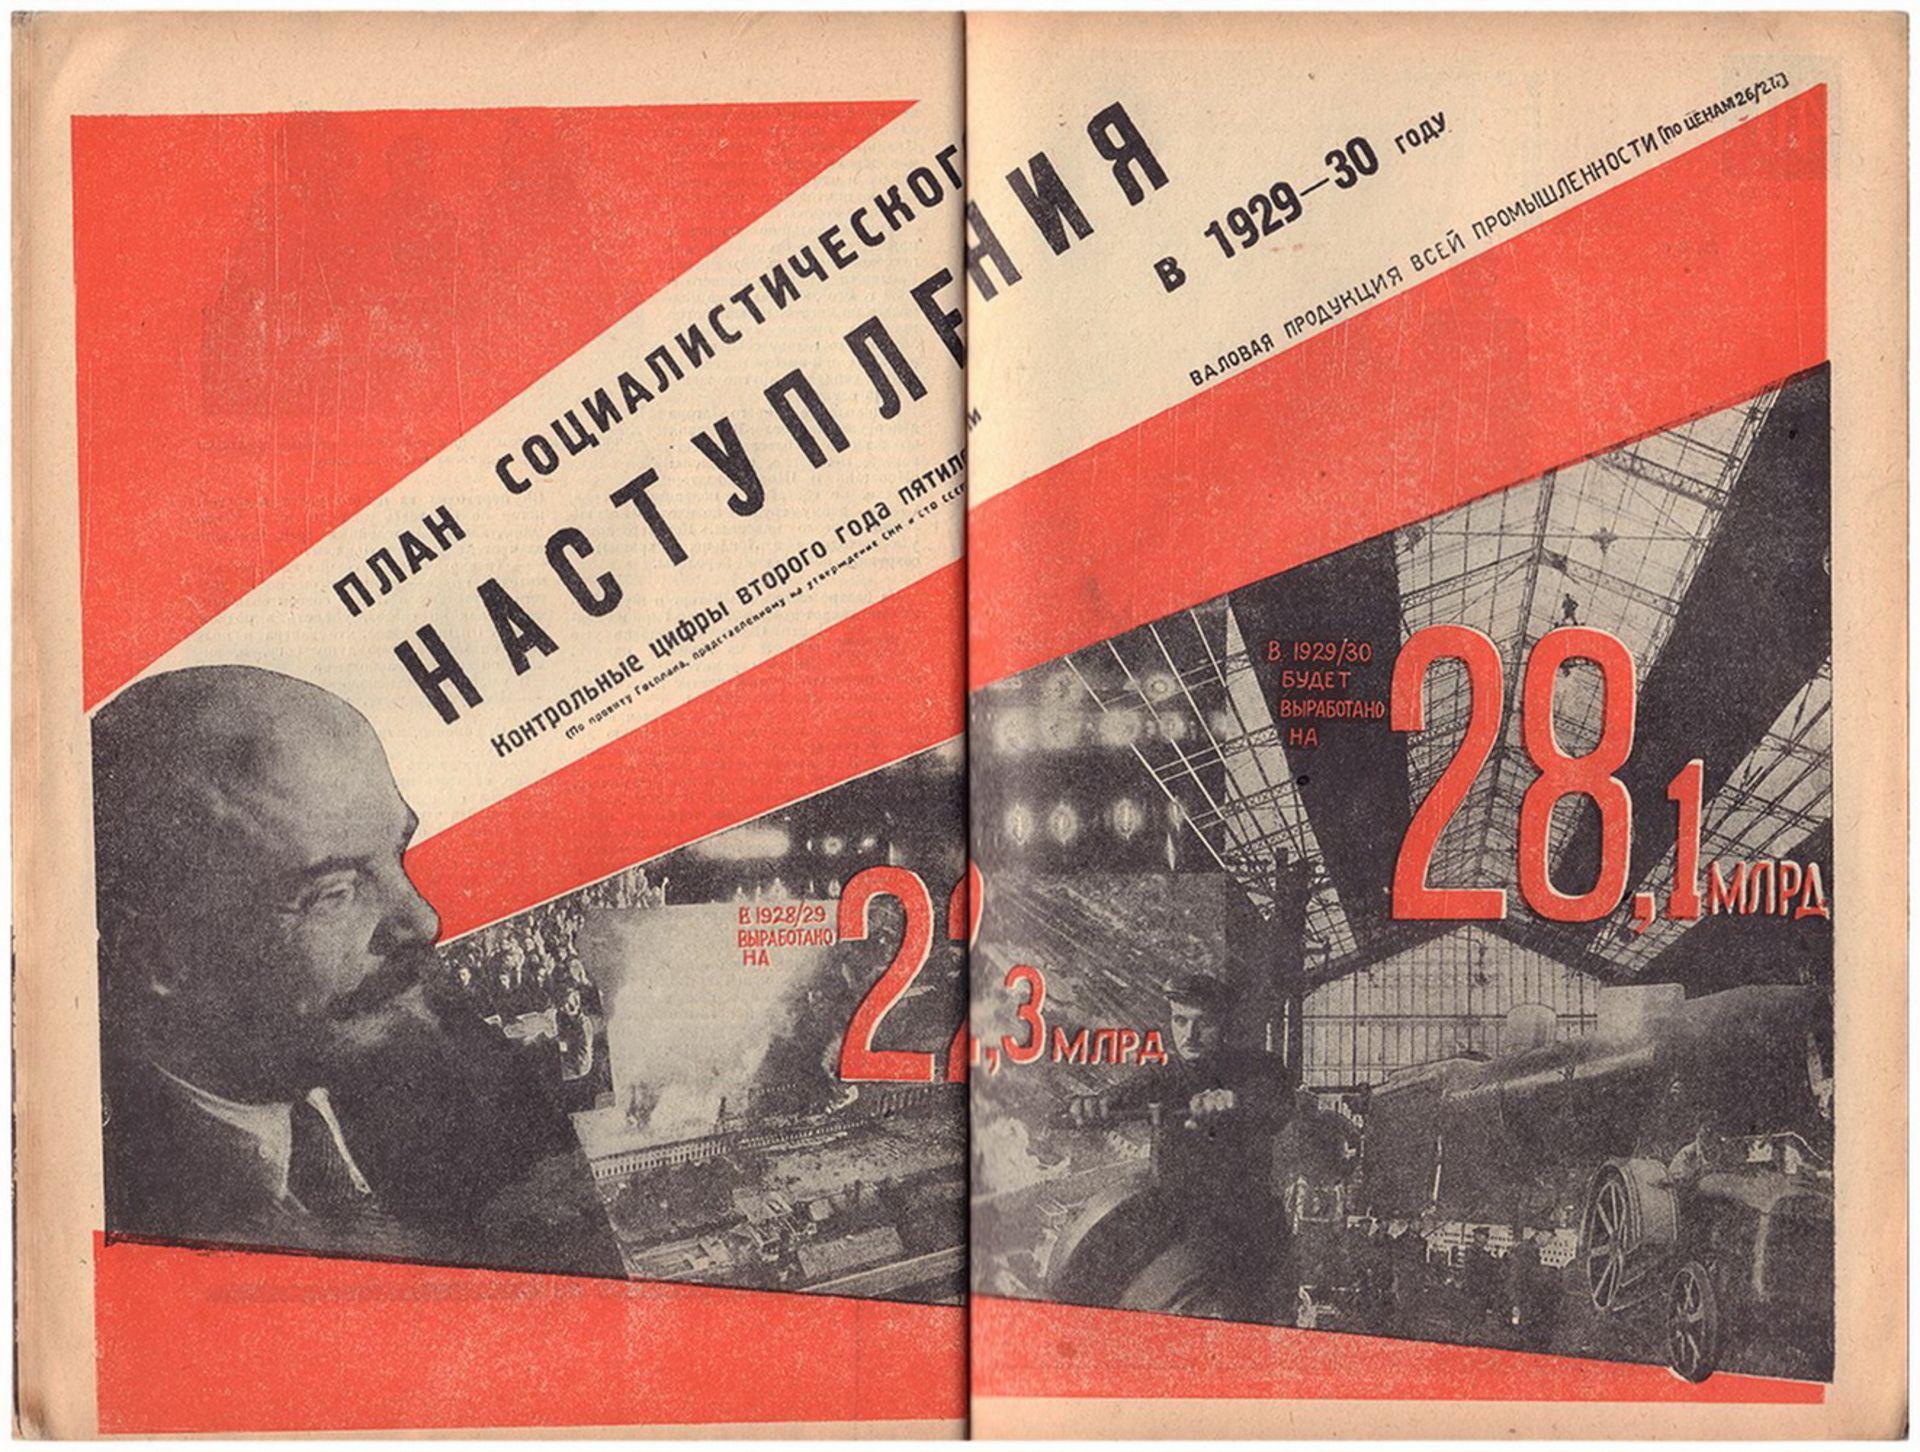 [Gustav Klutsis, photomontages. Rodchenko, A. photographs. Soviet art]. 30 days: Magazine. Issue 11t - Bild 2 aus 3